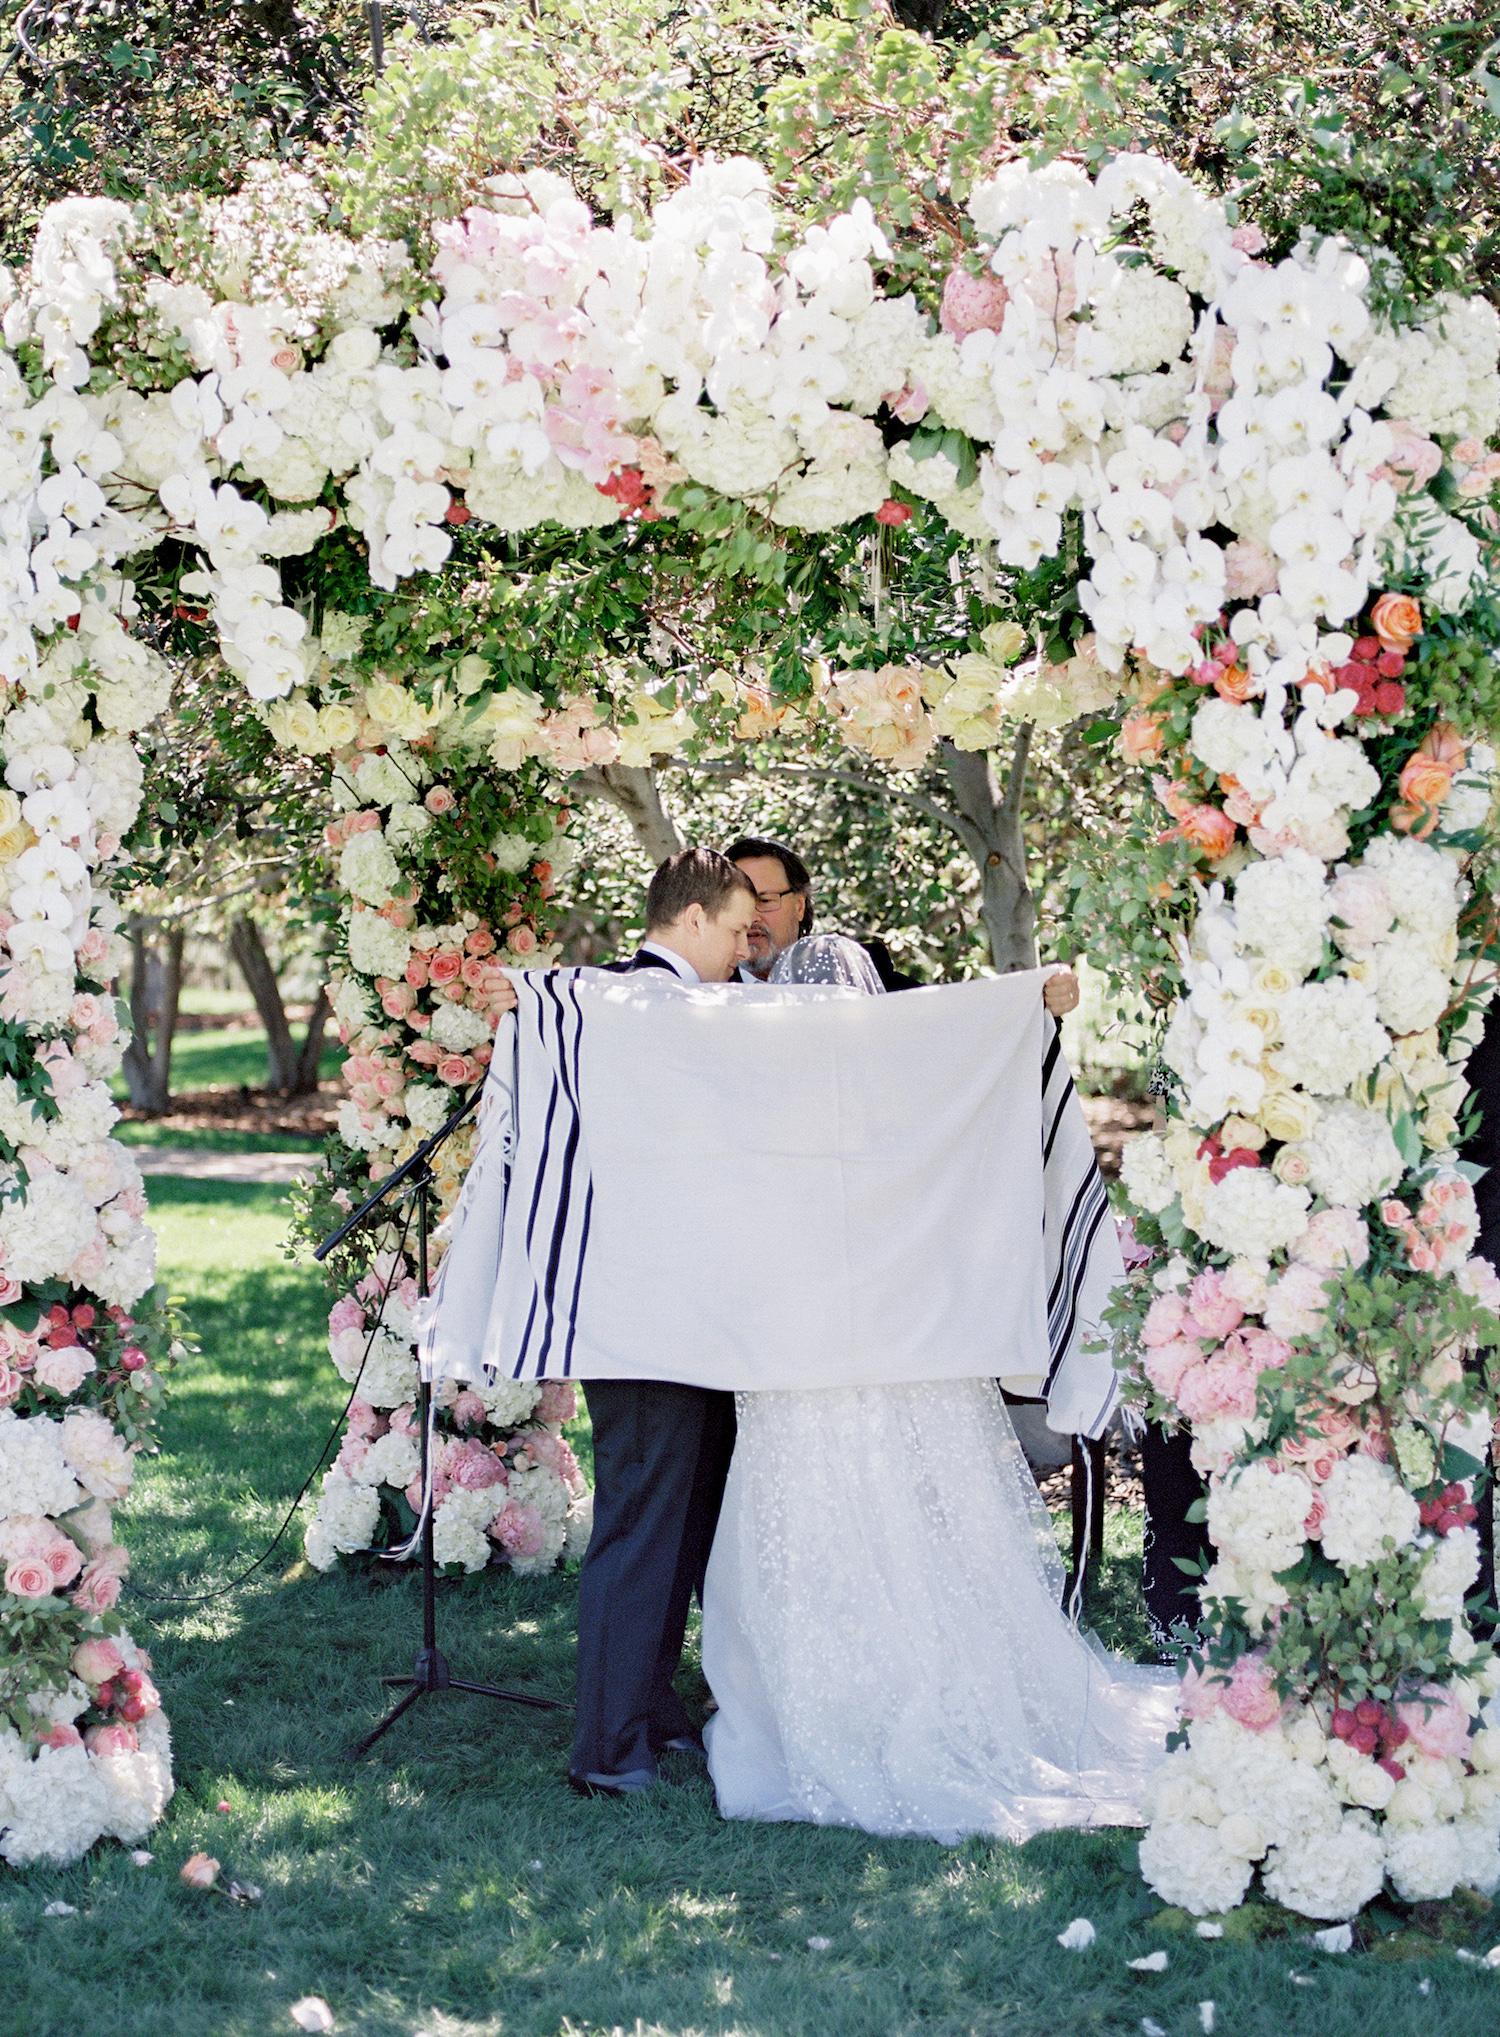 micro-wedding-garden-jewish-ceremony-under-floral-chuppah